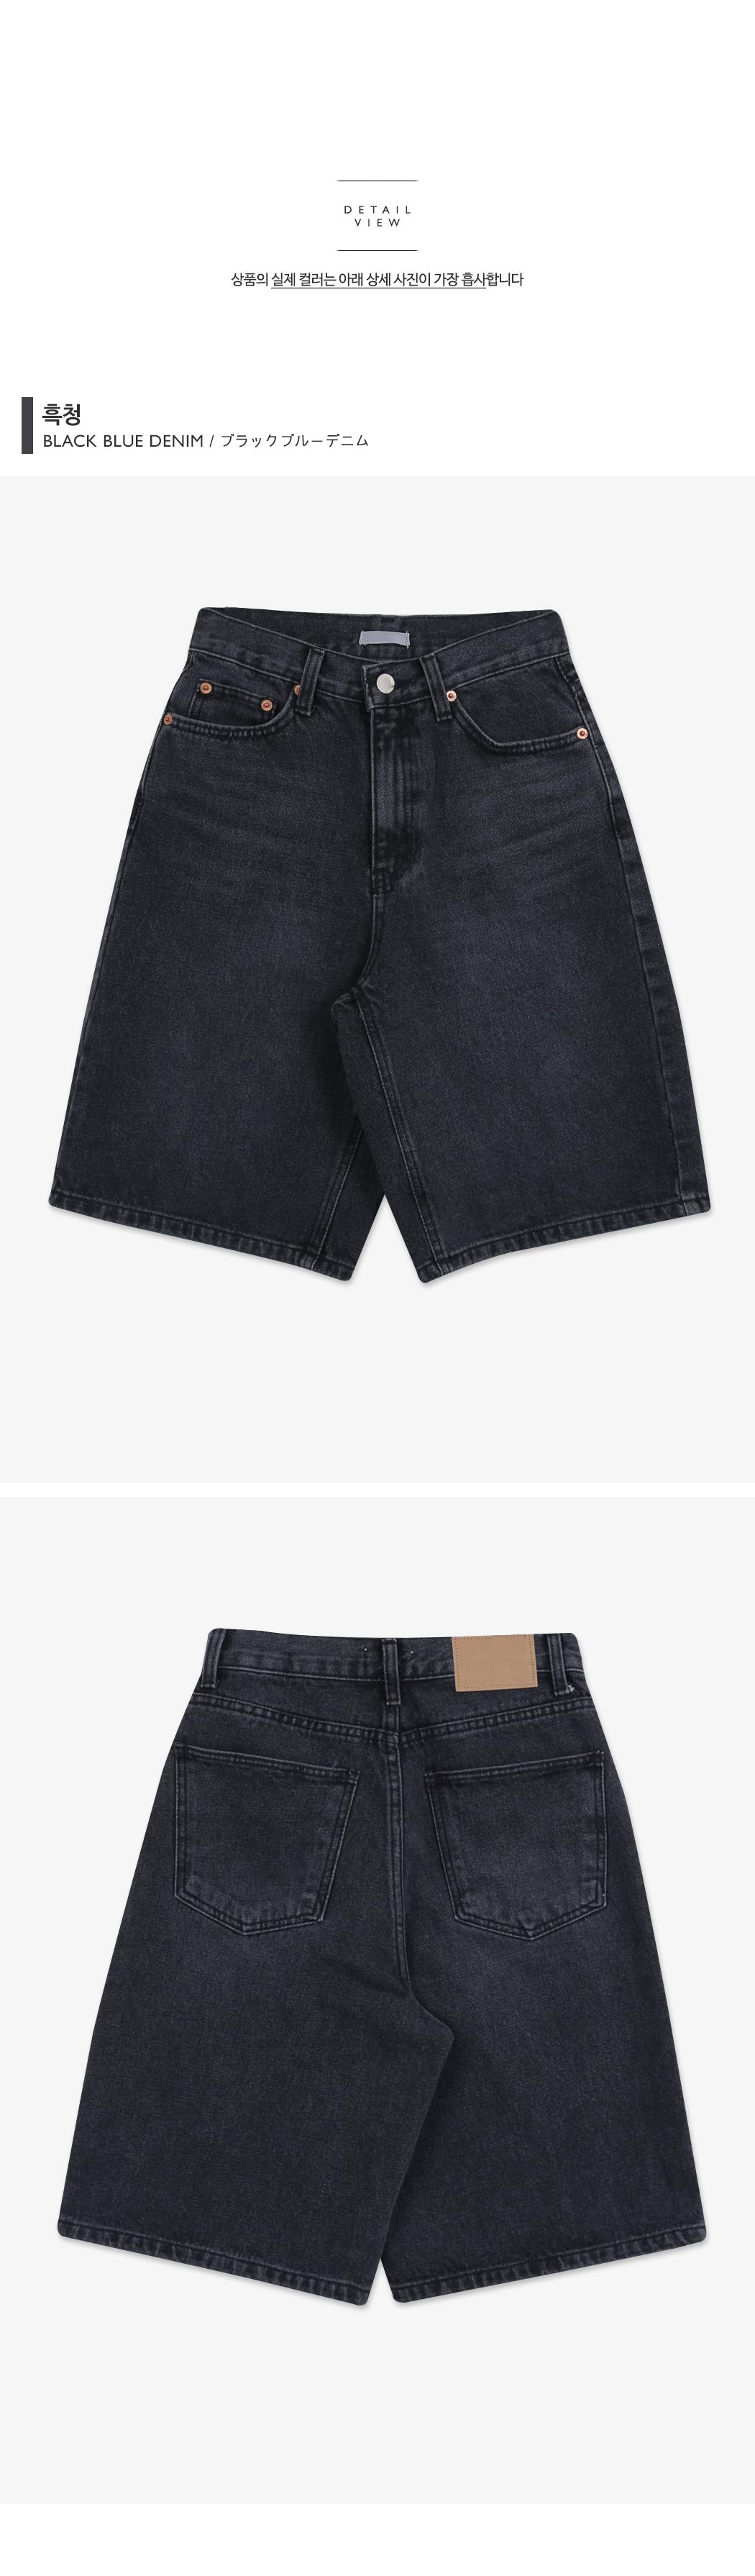 Vintage Stone 5 Piece Denim Shorts